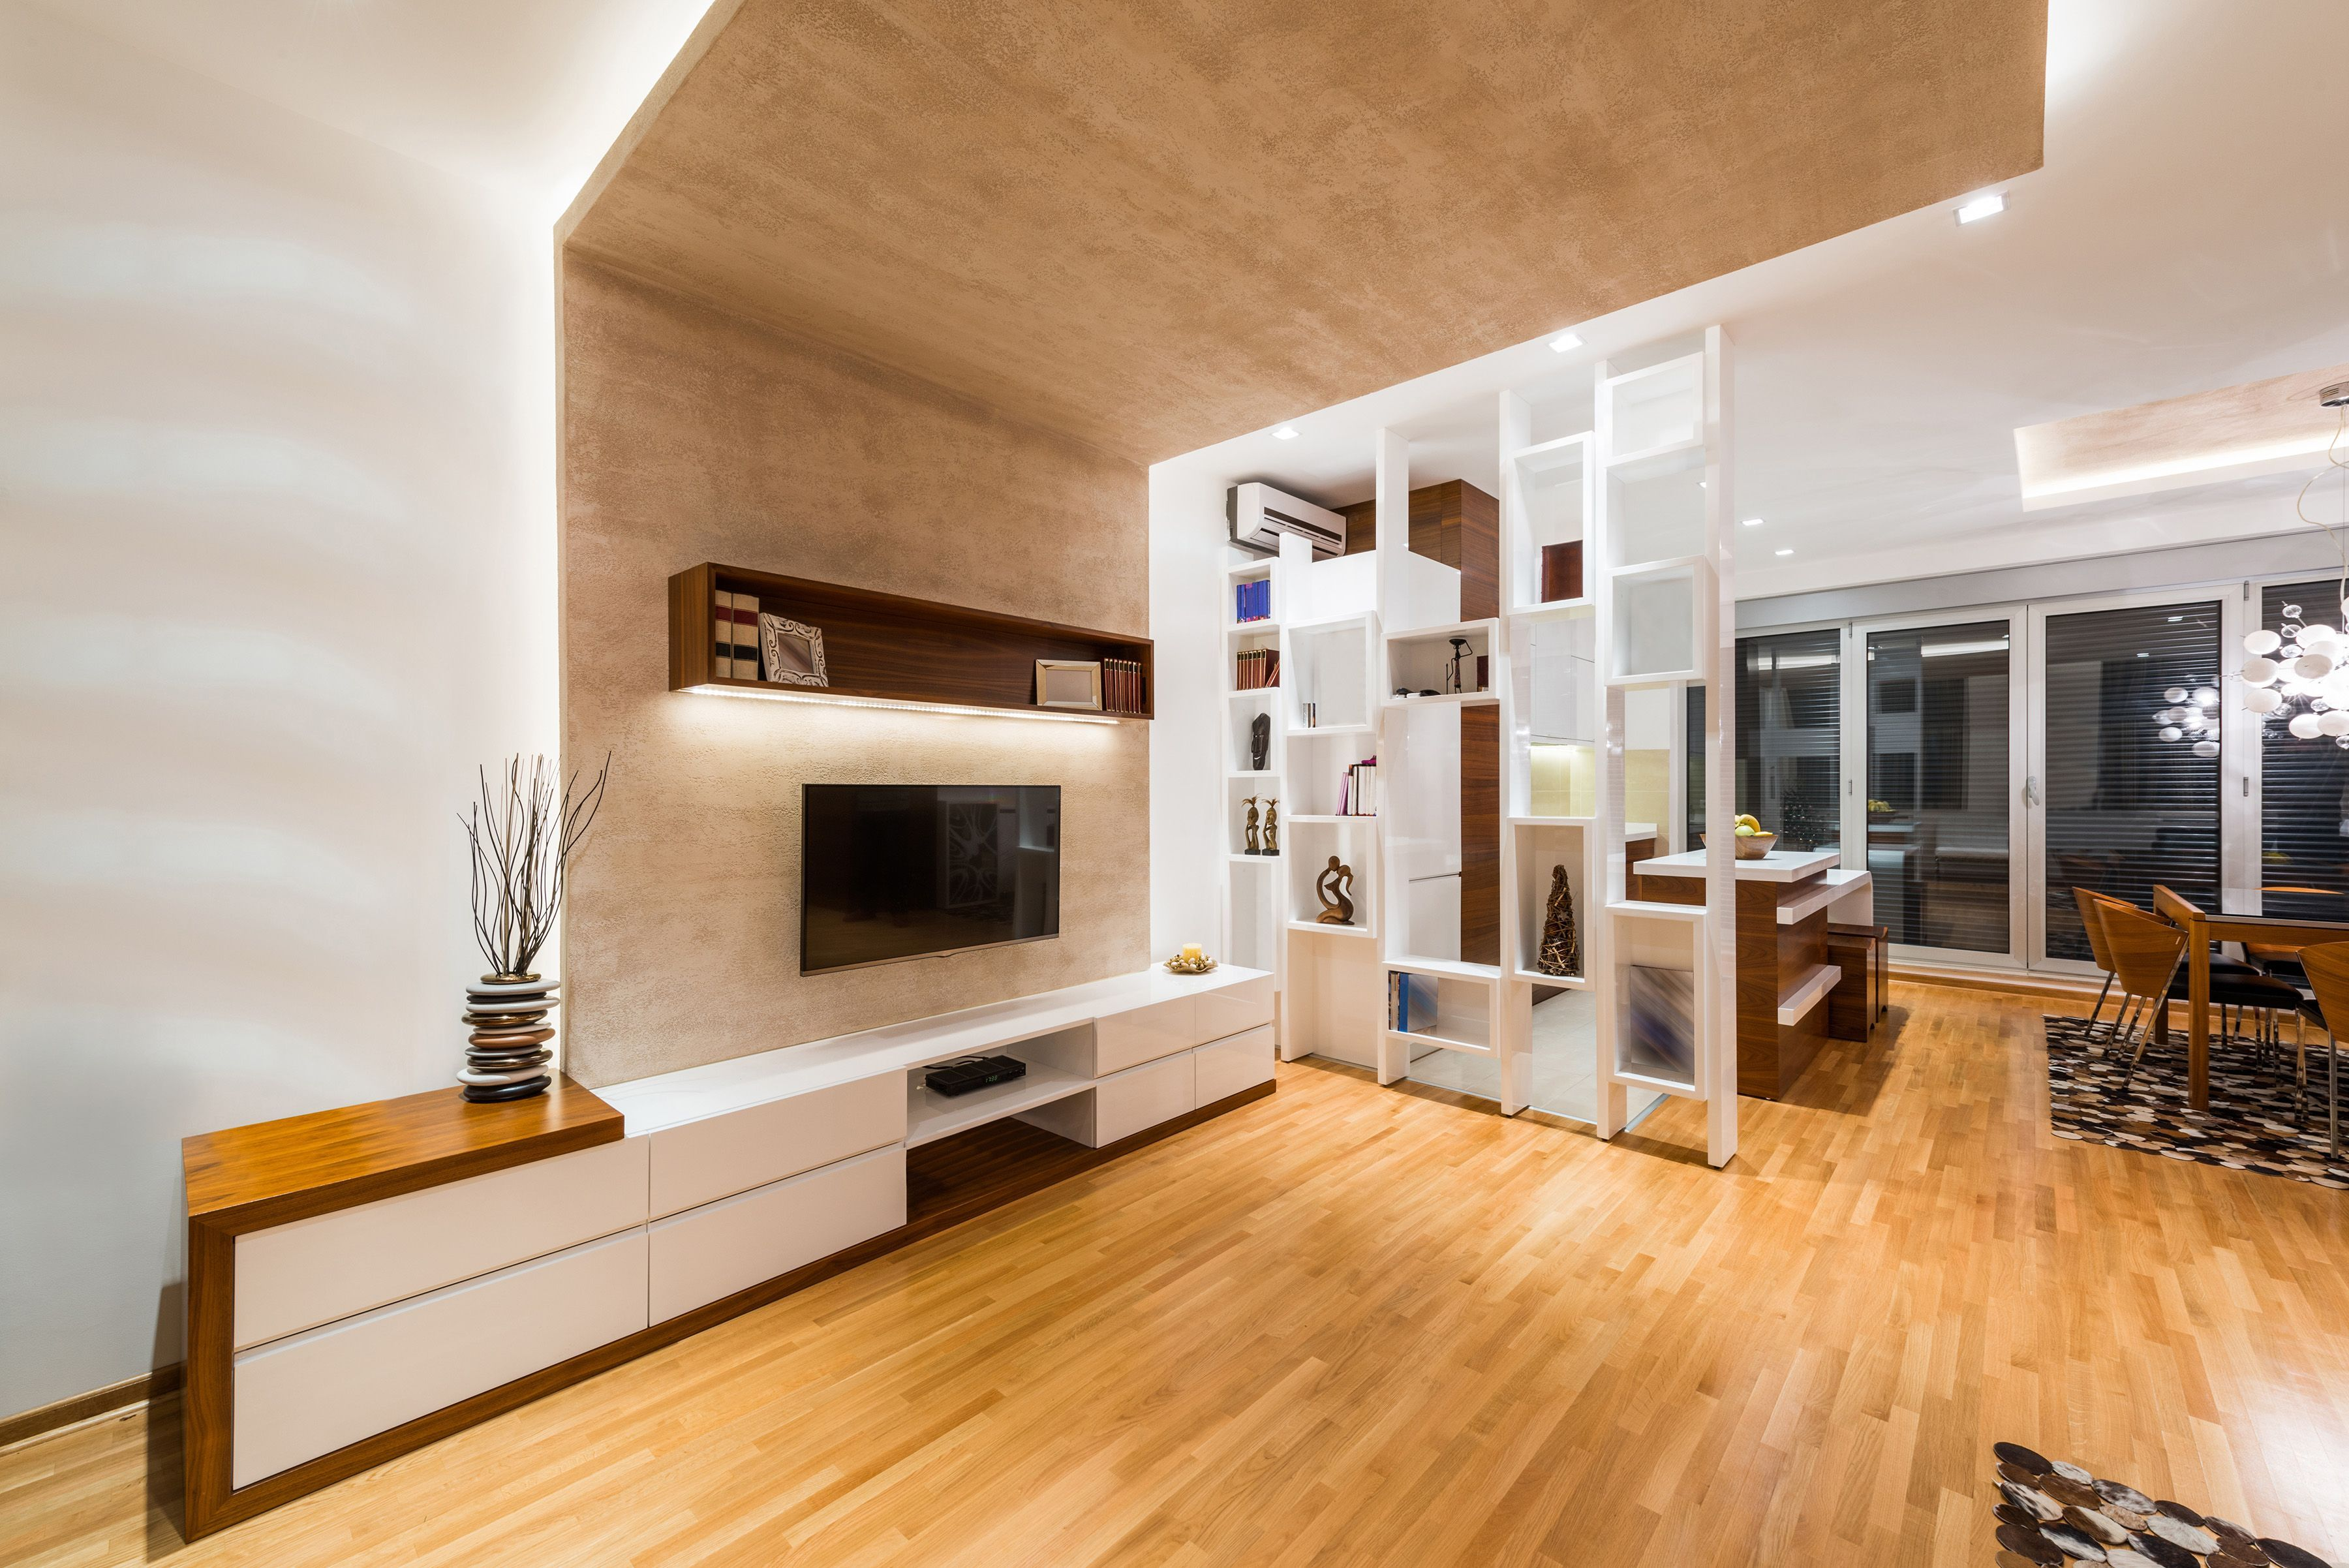 Palladiana Terrazzo Floor Miami Residence Installed by